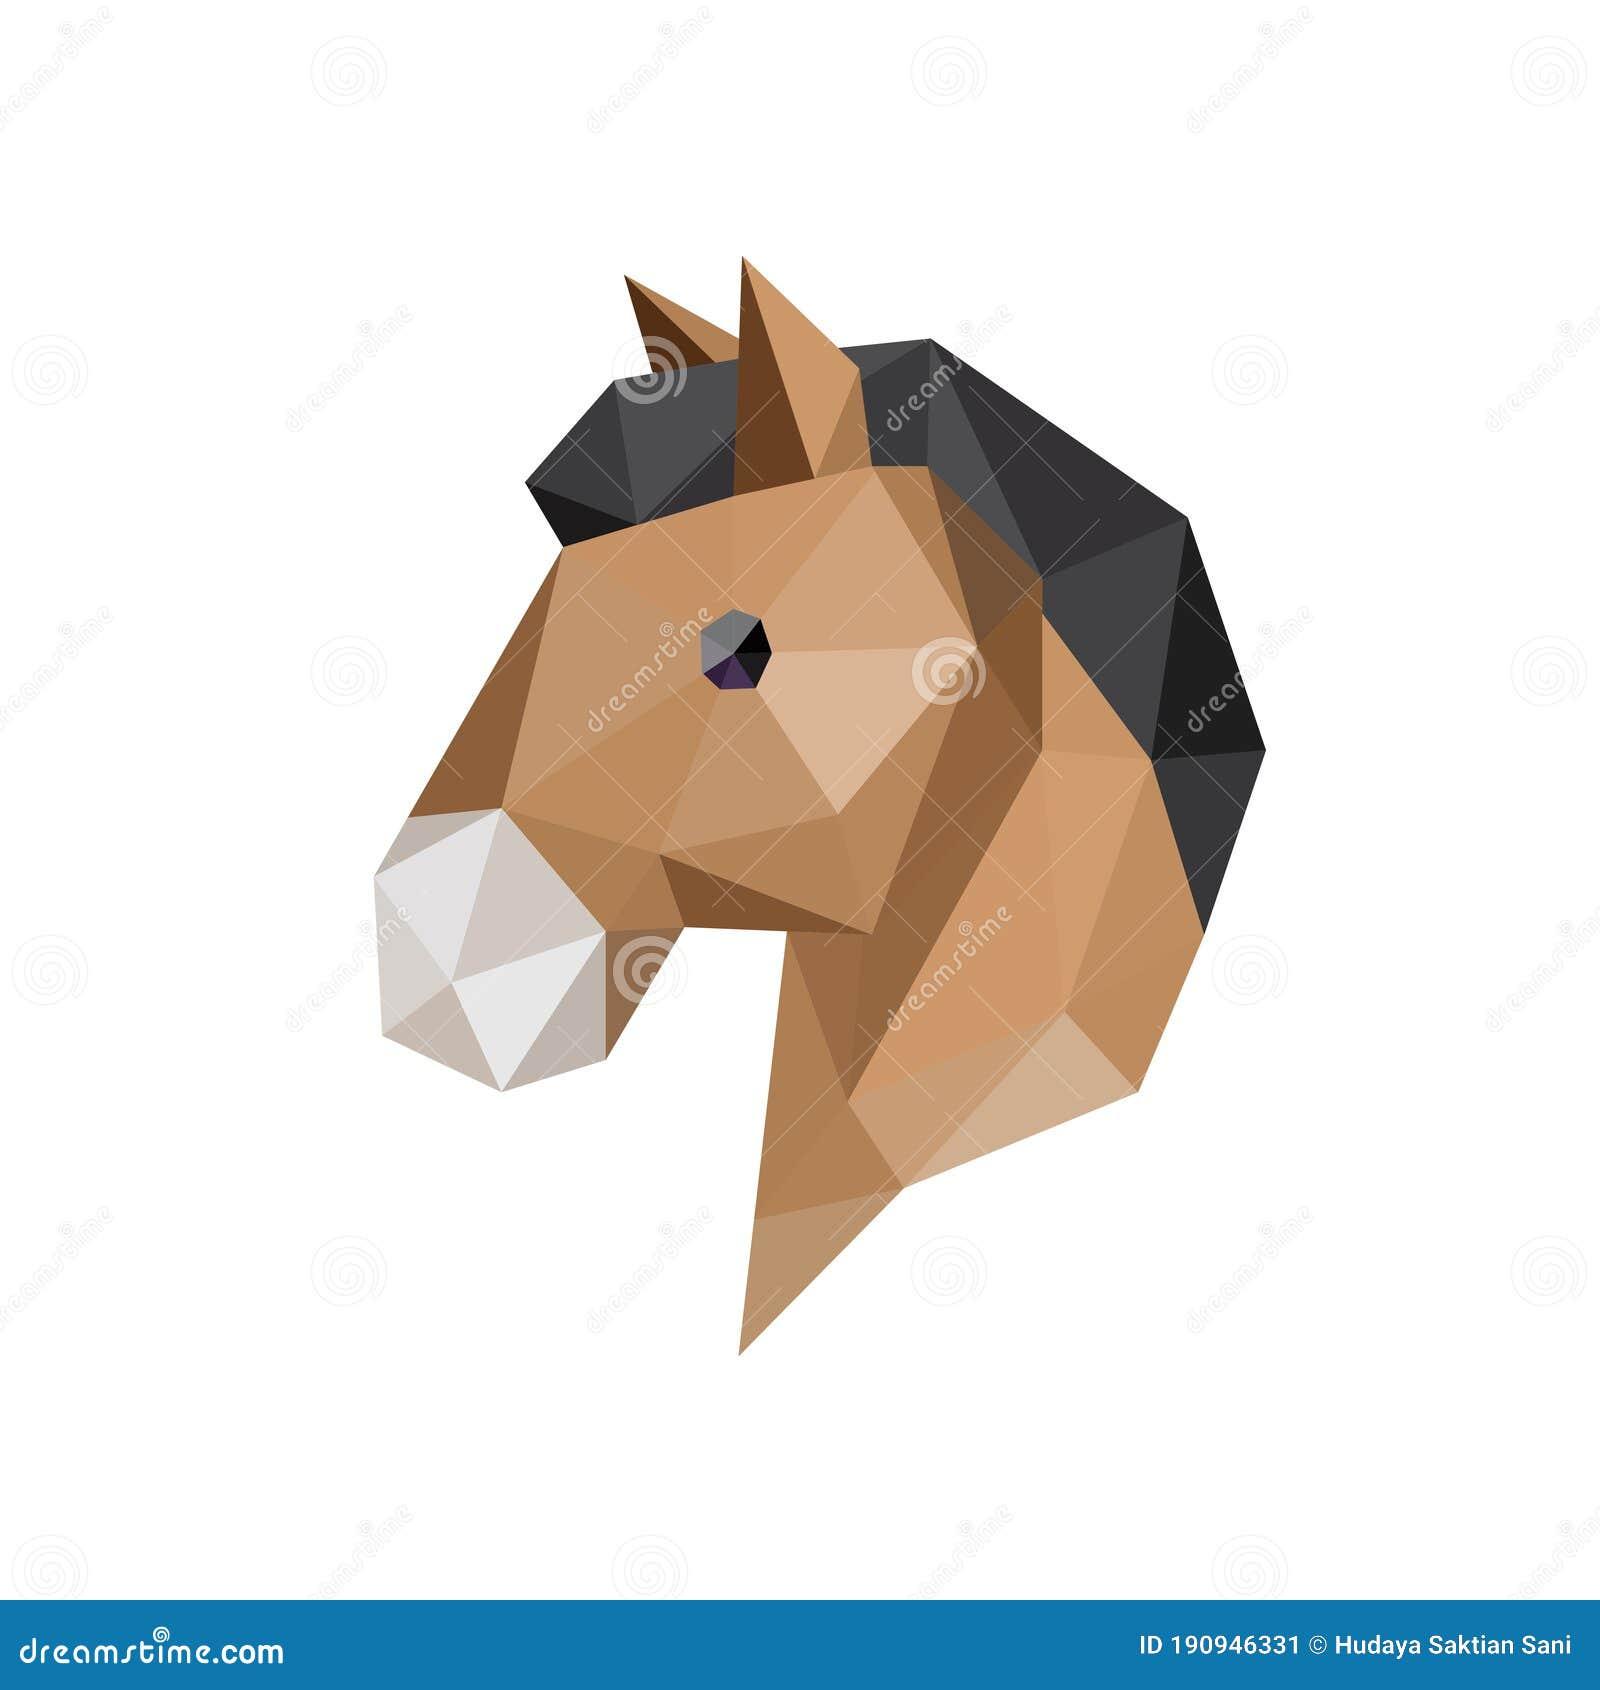 Horse Head With Polygonal Geometric Style Stock Vector Illustration Of Farm Logo 190946331